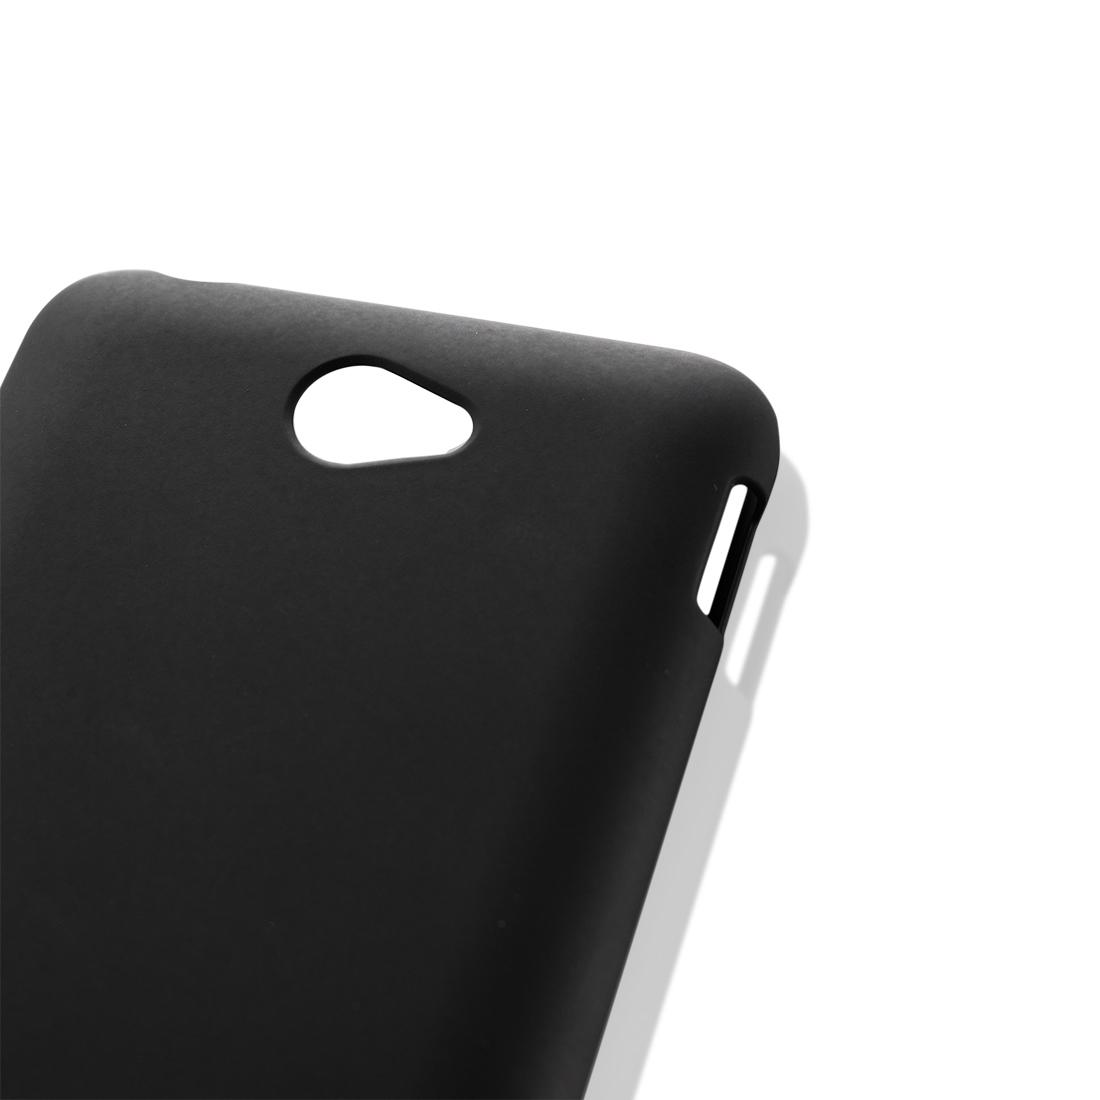 Пластиковая накладка для Xperia E4 чёрного цвета